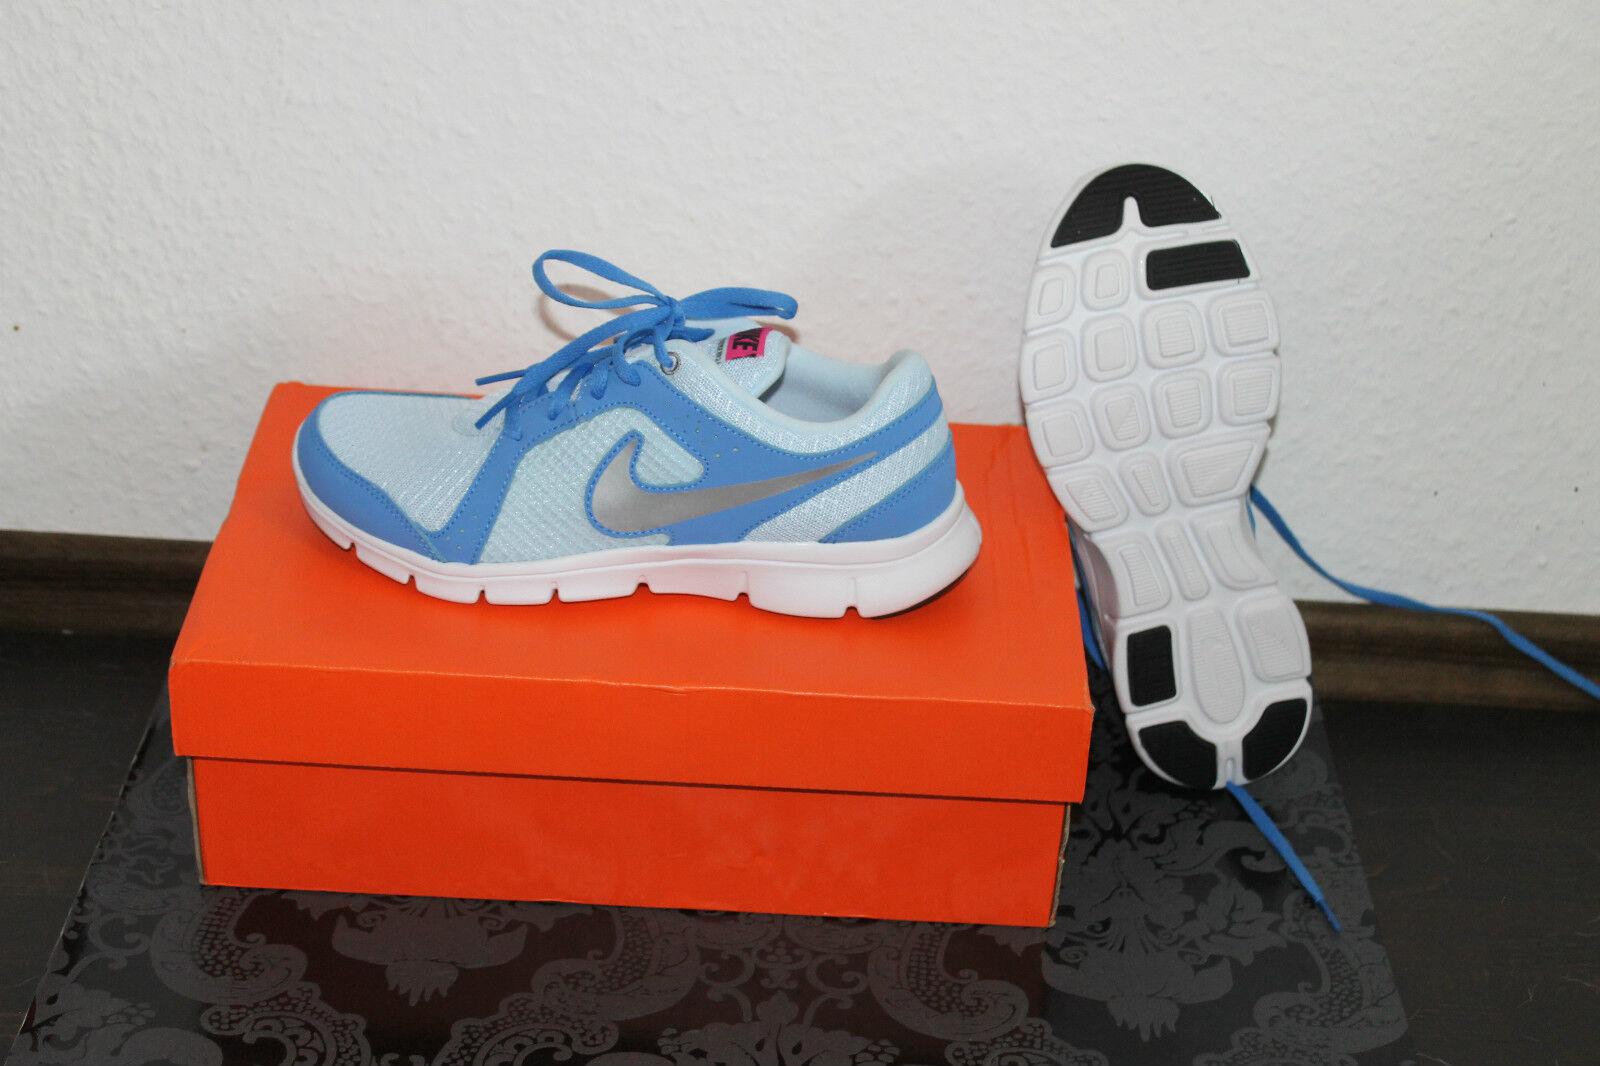 Nike Flex Damen Running Schuhe Blau Größe 38 UK 5 oder 38,5 Uk 5,5 Neu